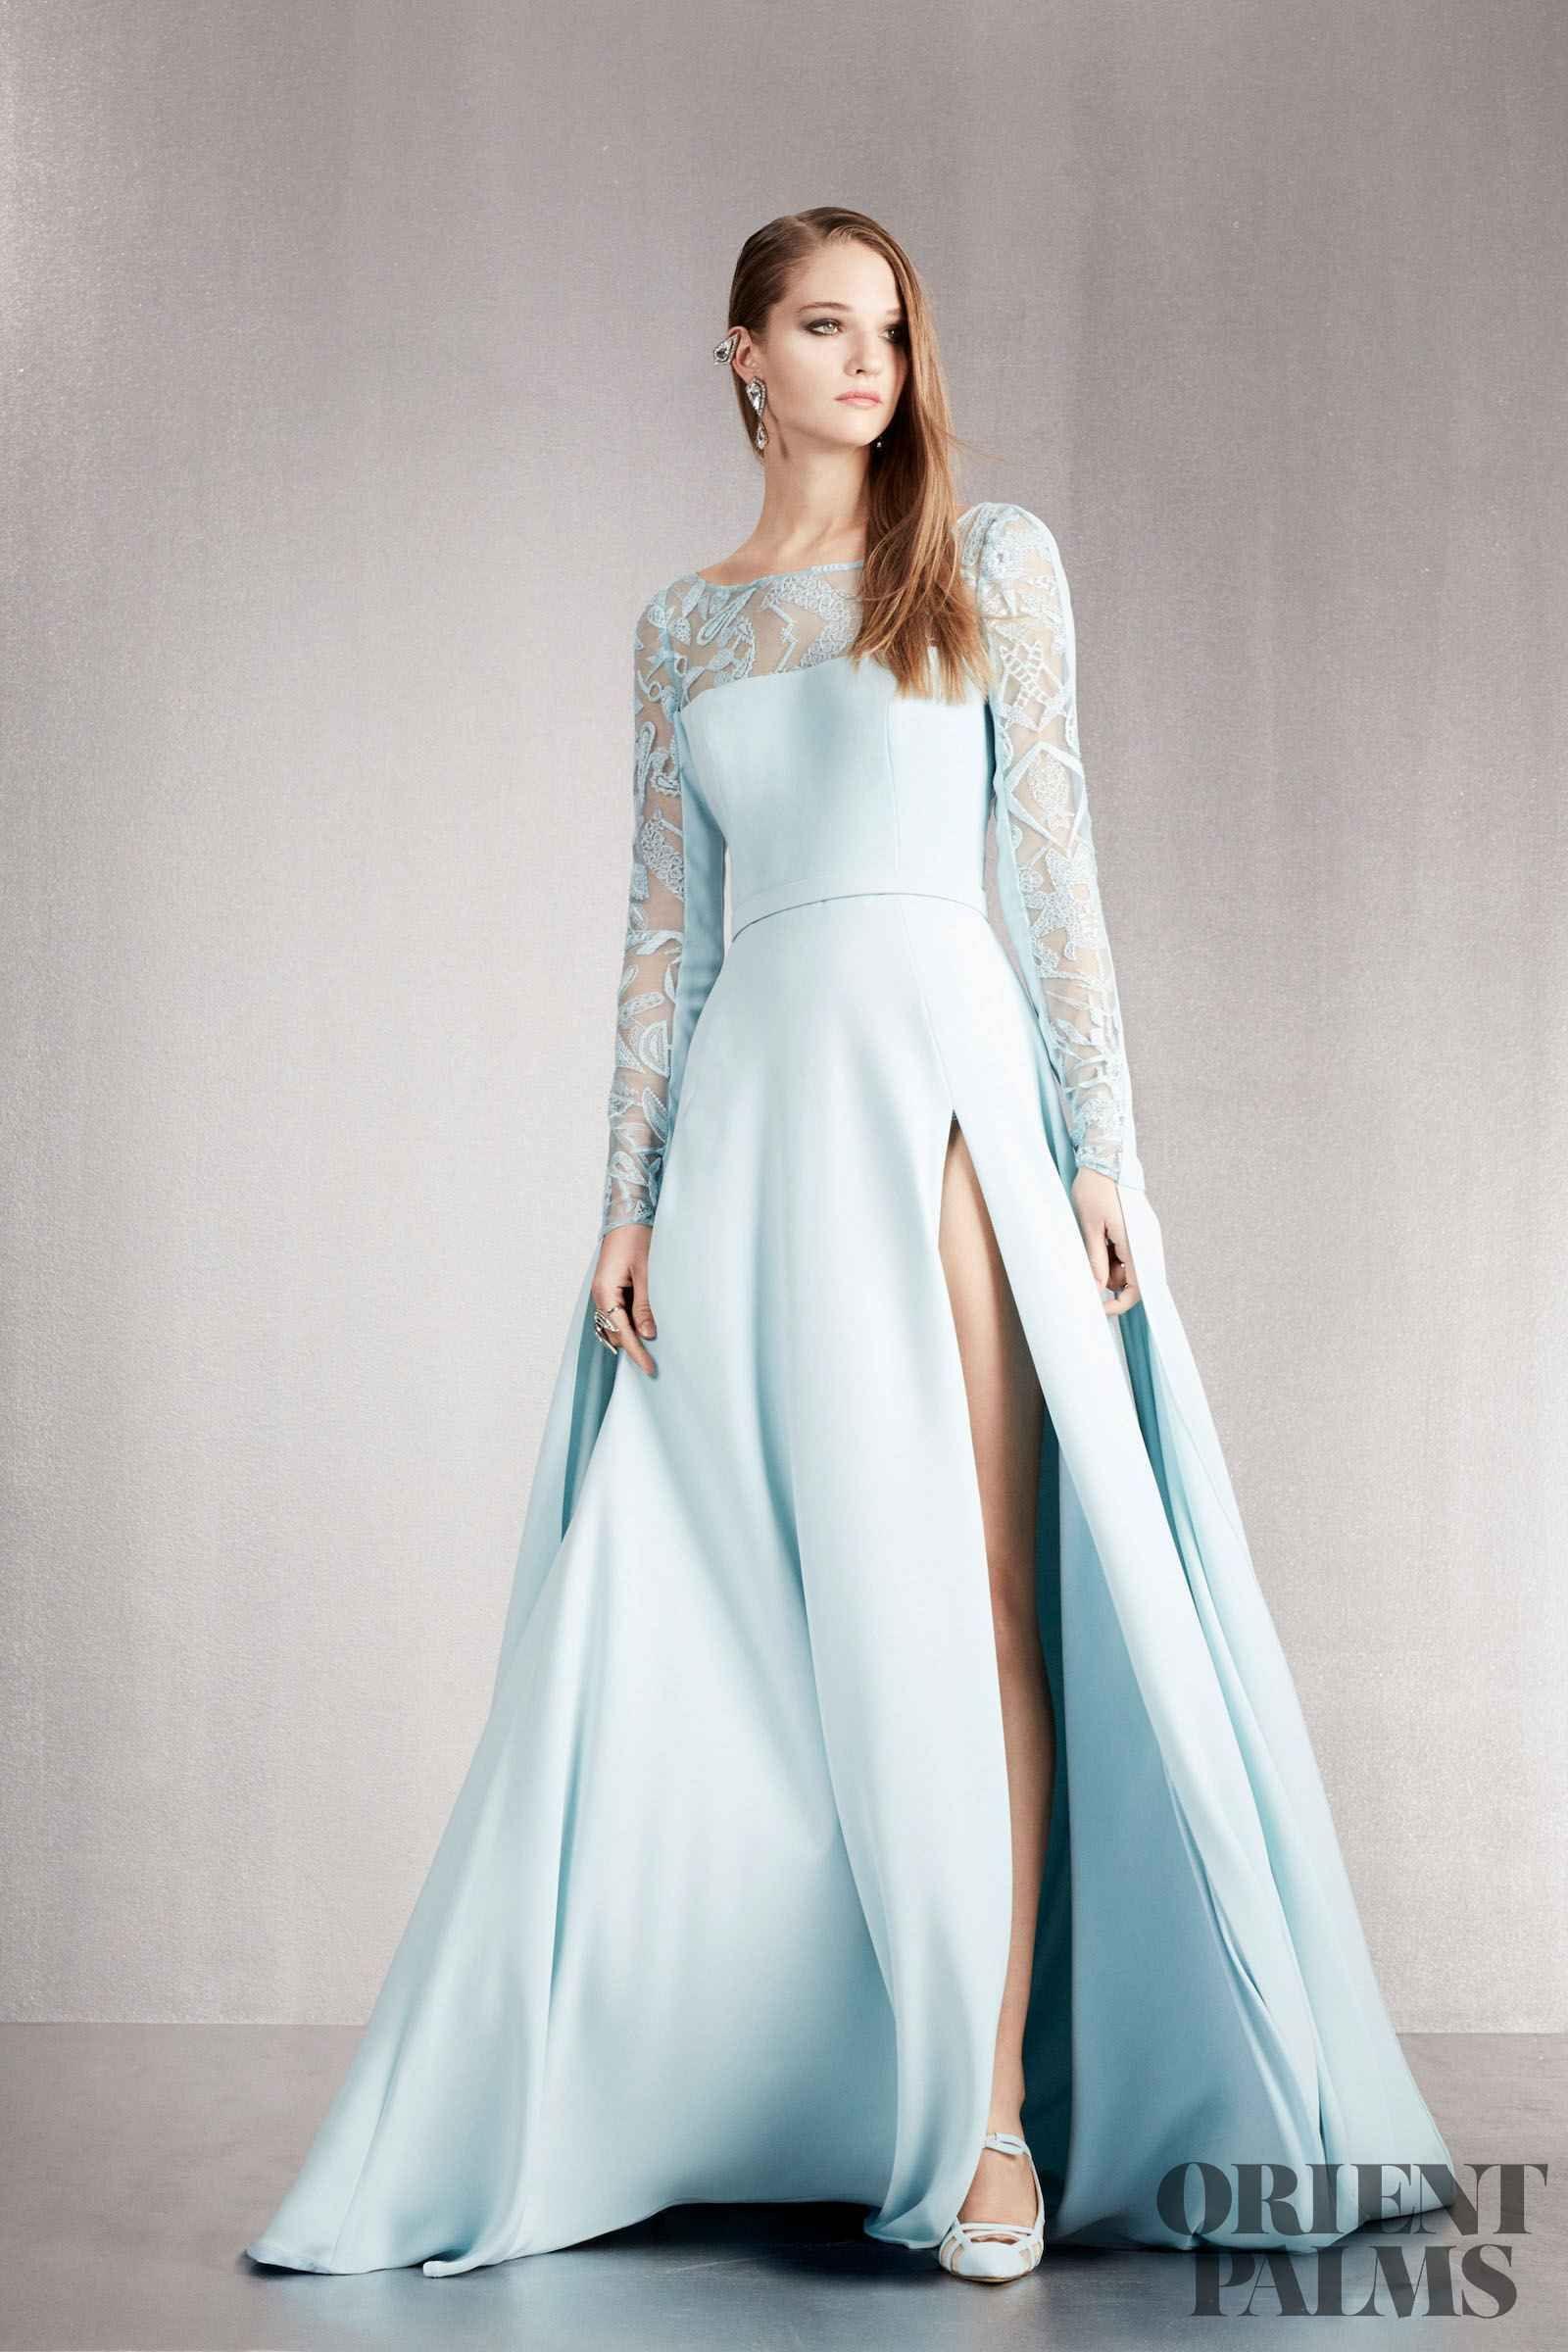 f51ceb005d403 Georges Hobeika İlkbahar-Yaz 2018 - Hazır giyim | Heavenly Blue ...